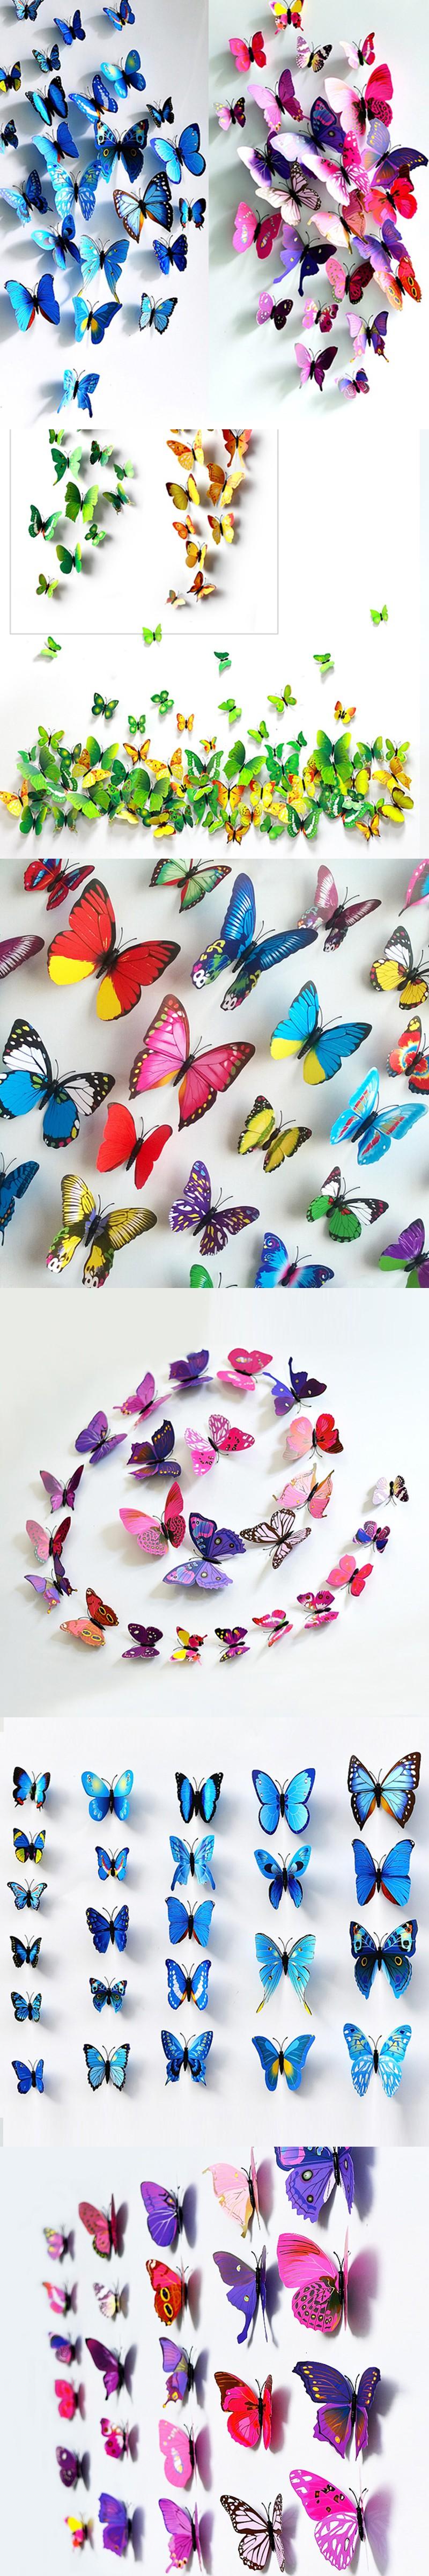 Pcs PVC D Butterfly Wall Decor Cute Butterflies Wall Stickers - Wall decals butterfliespatterned butterfly wall decal vinyl butterfly wall decor